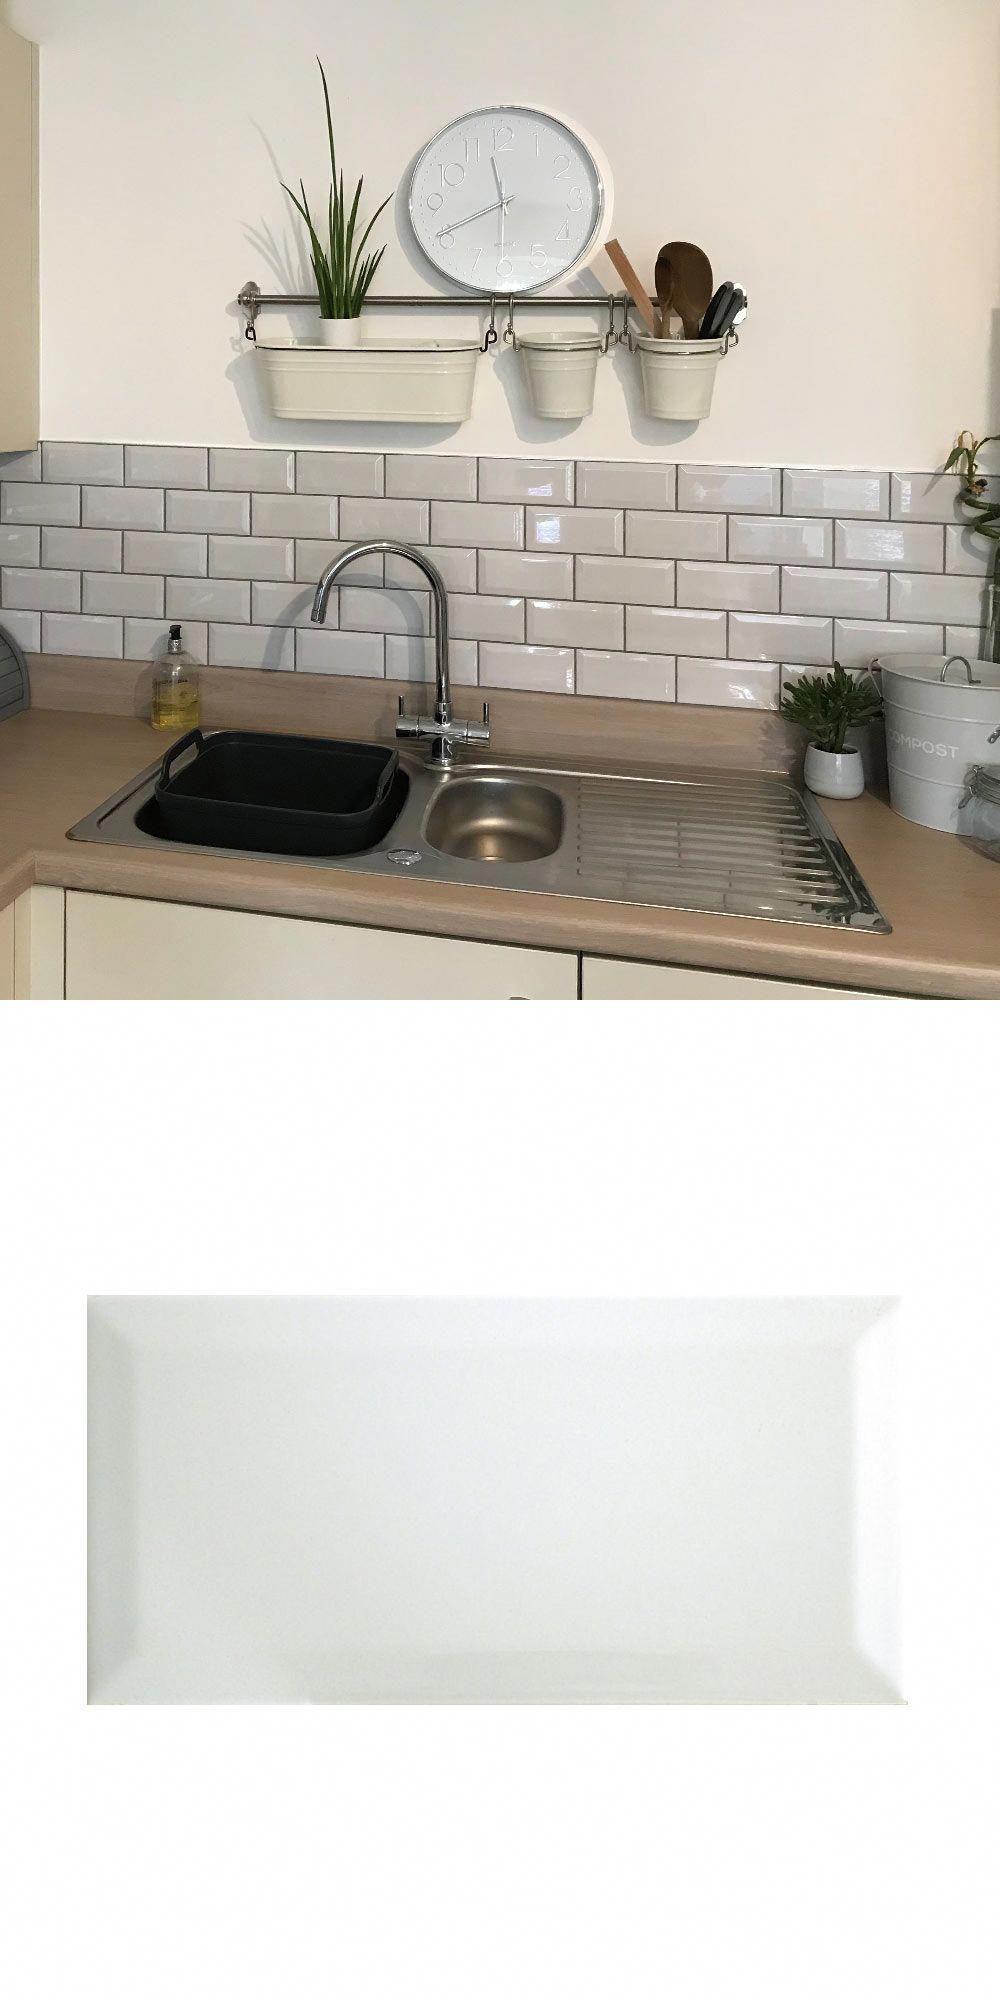 Elizabeth Created A Traditional Kitchen Splashback With Grey Metro Tiles In 2020 Grey Kitchen Tiles Kitchen Wall Tiles Grey Kitchen Wall Tiles